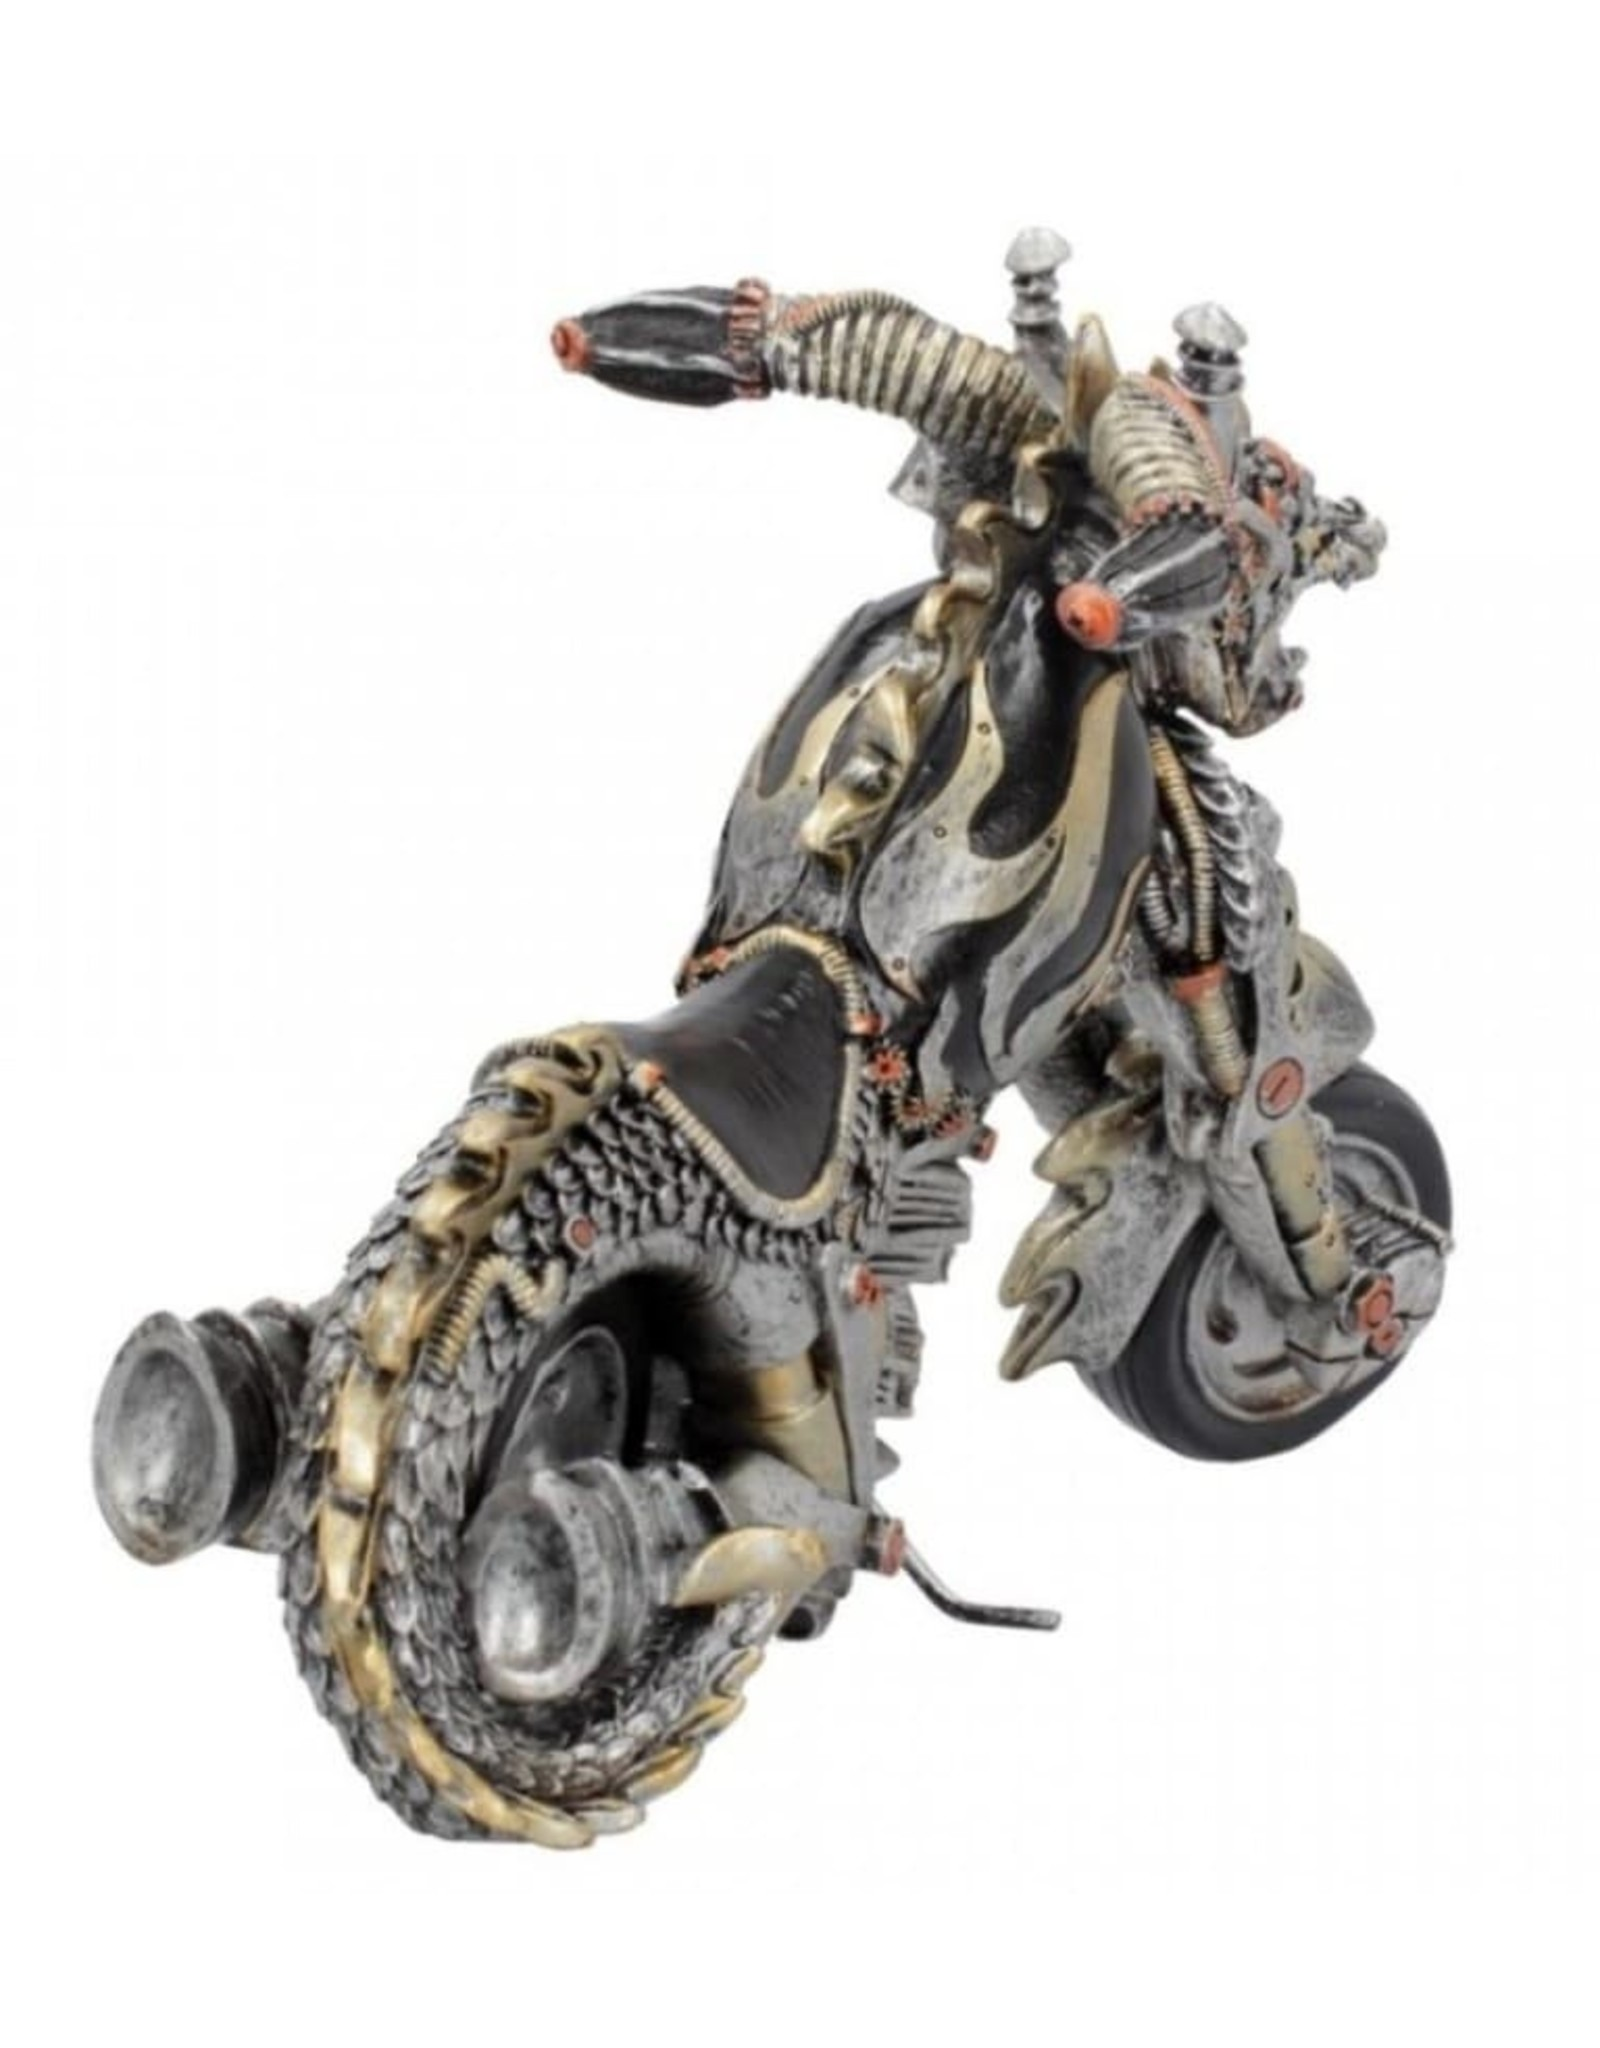 Alator Collectables - Dracus Birota Gothic Motorcycle figurine - Nemesis Now